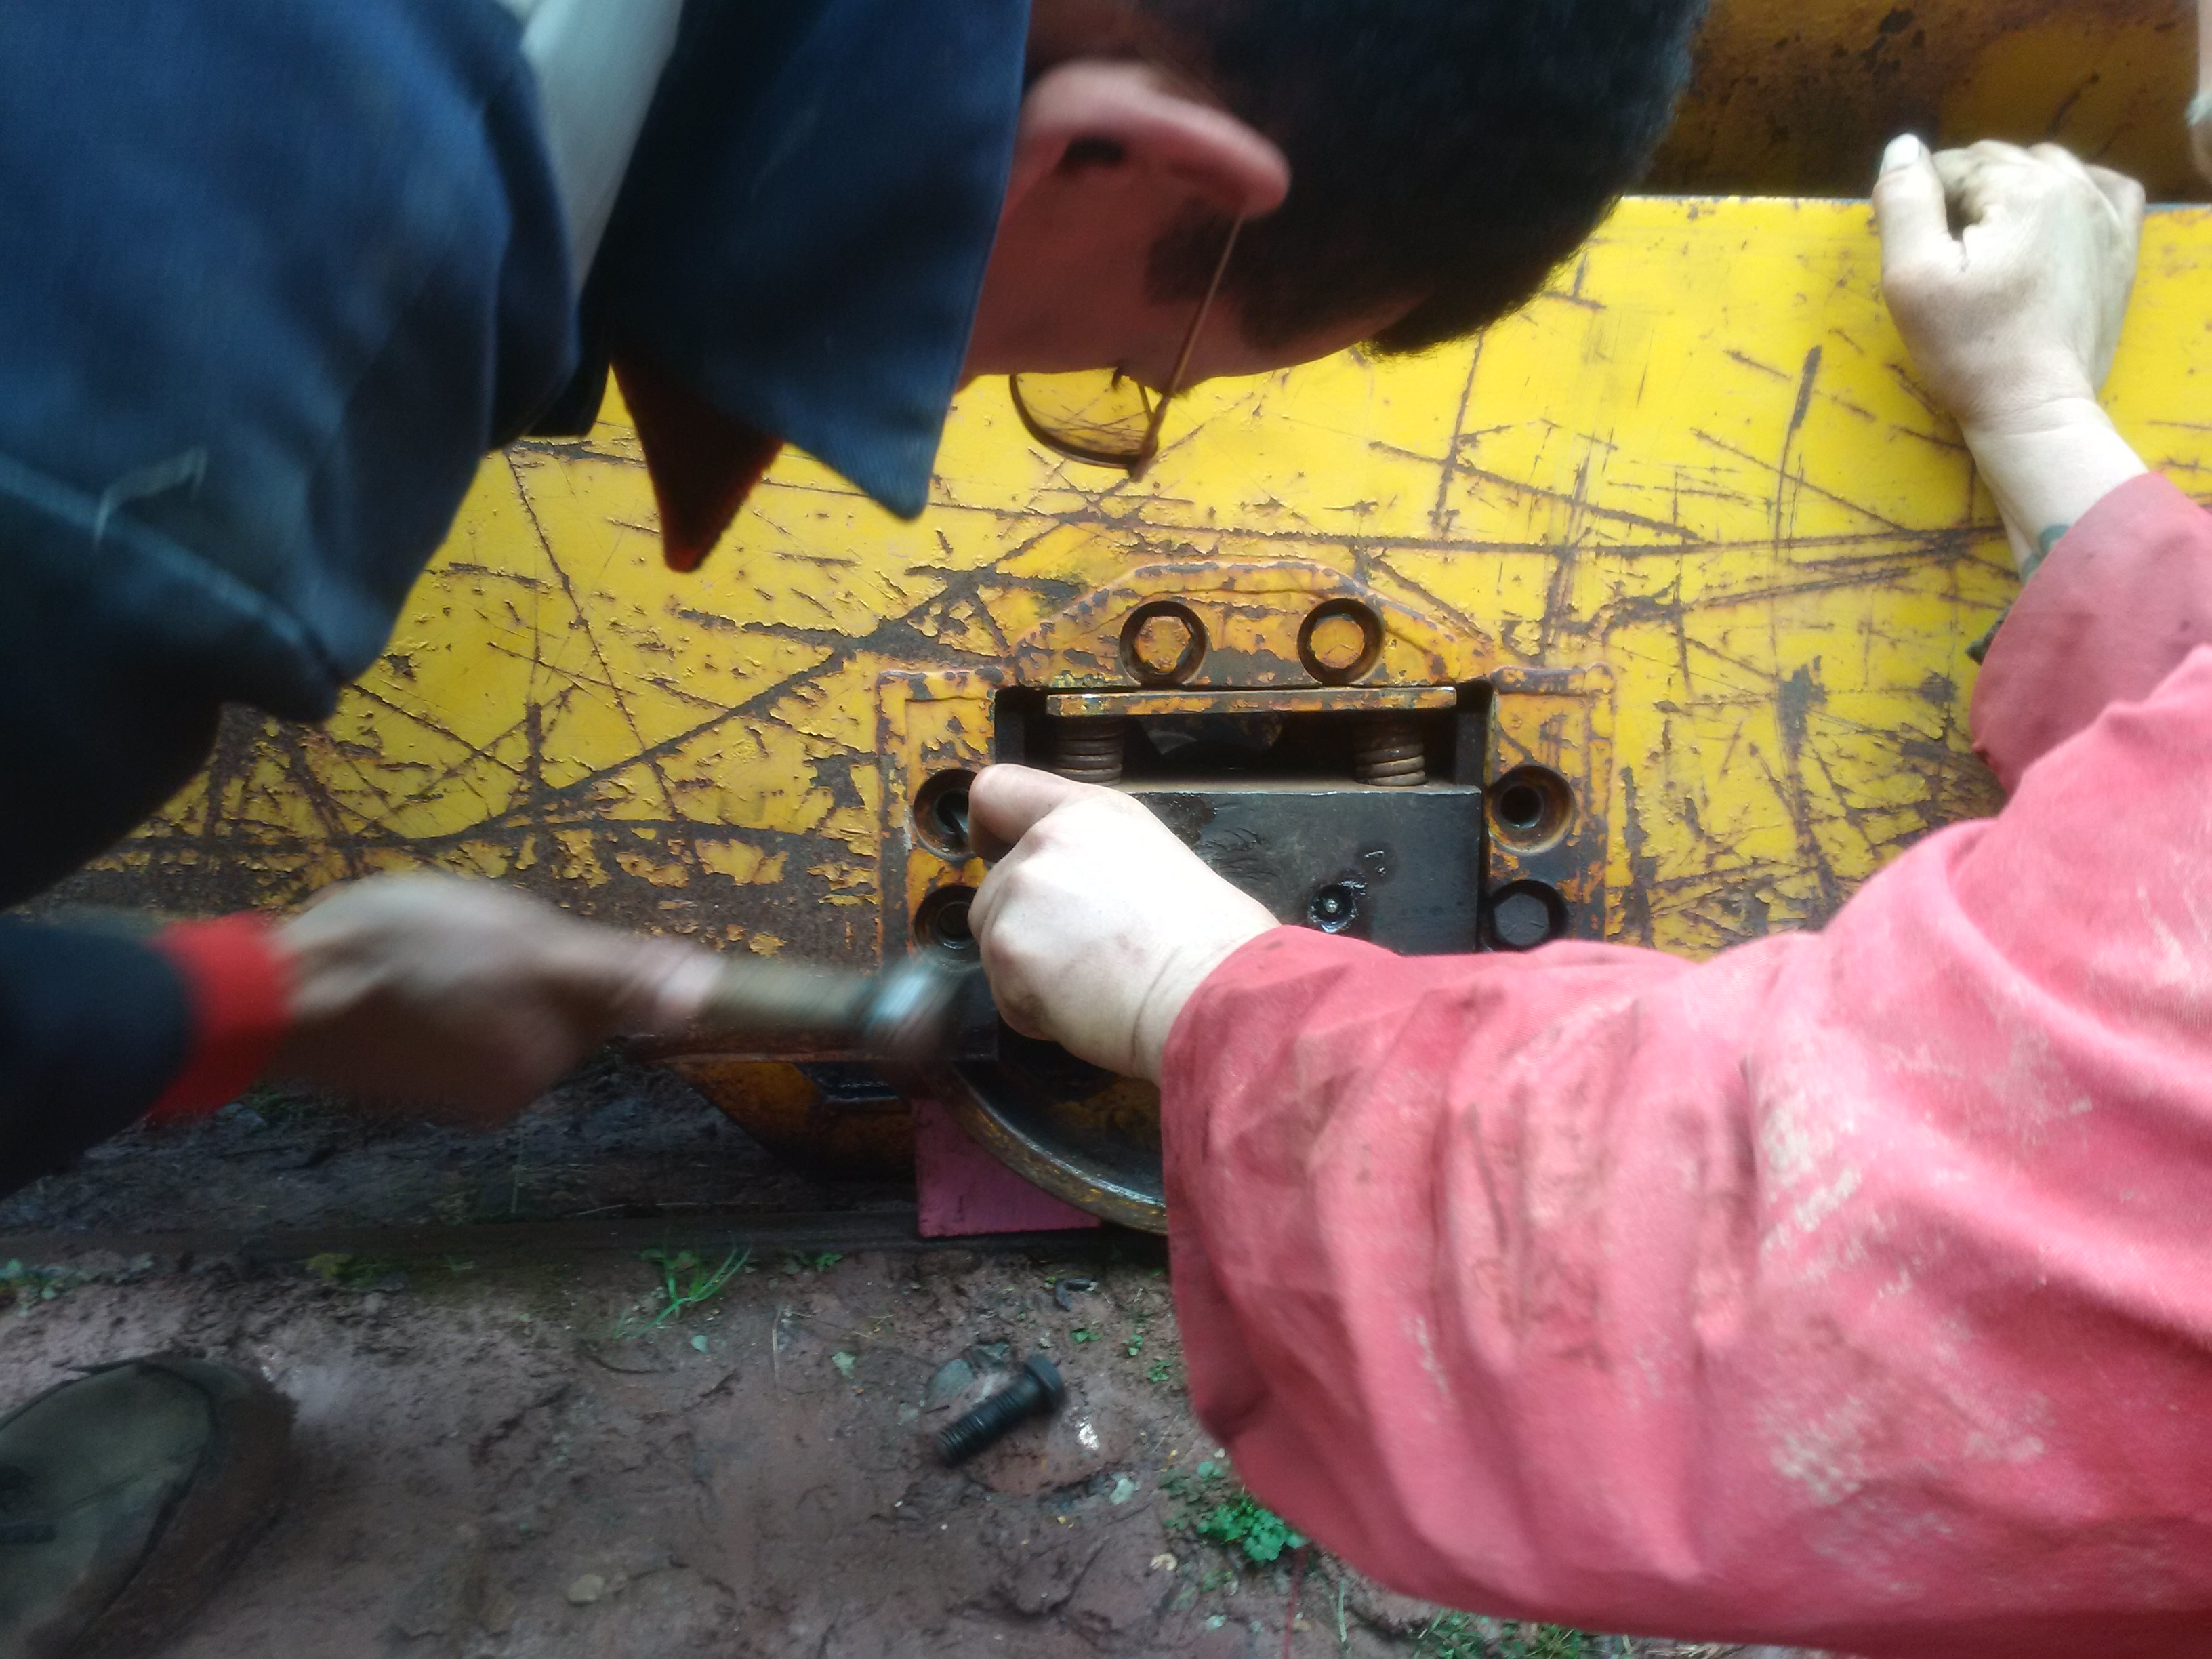 Percussive maintenance